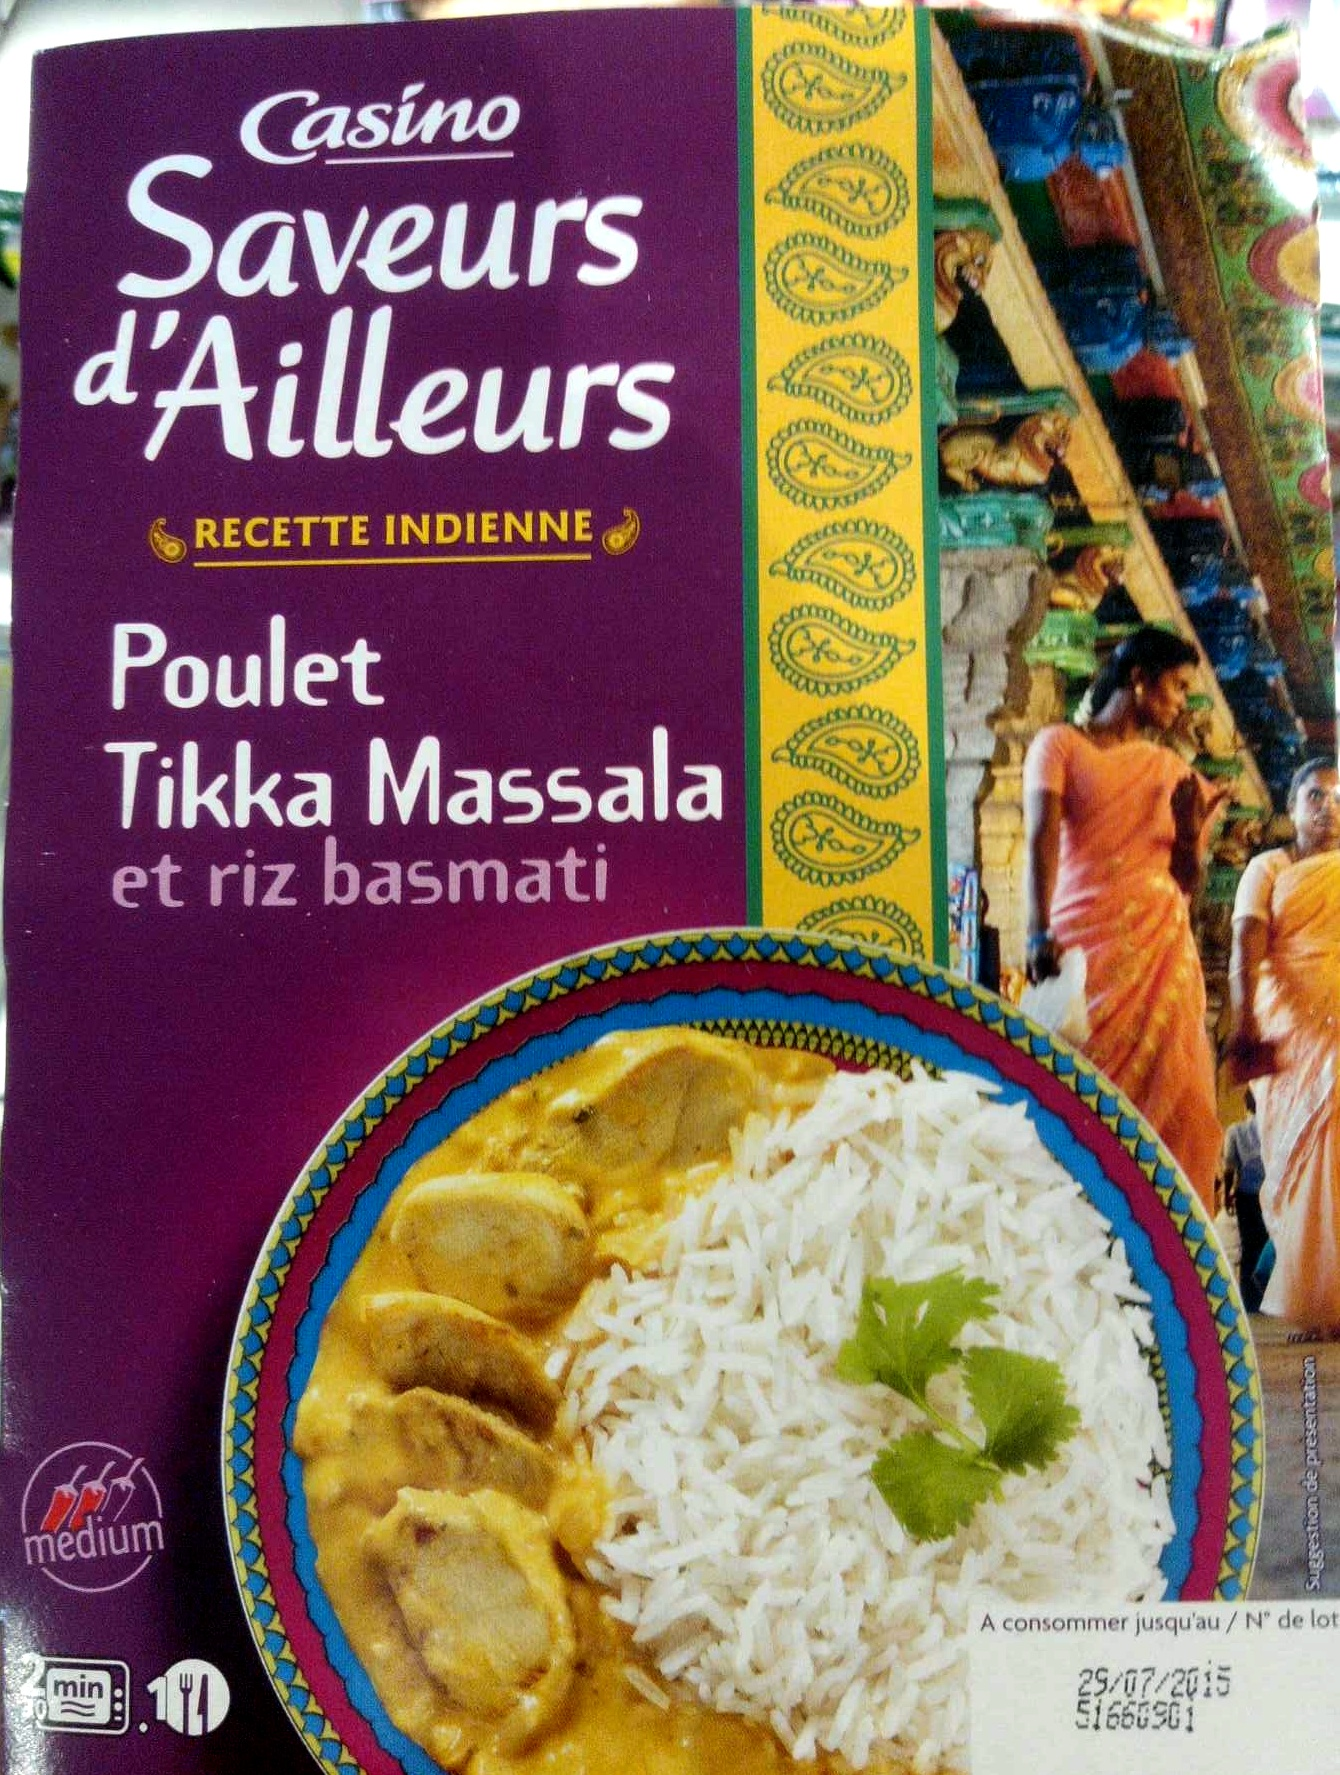 Poulet tikka massala et riz basmati - Product - fr